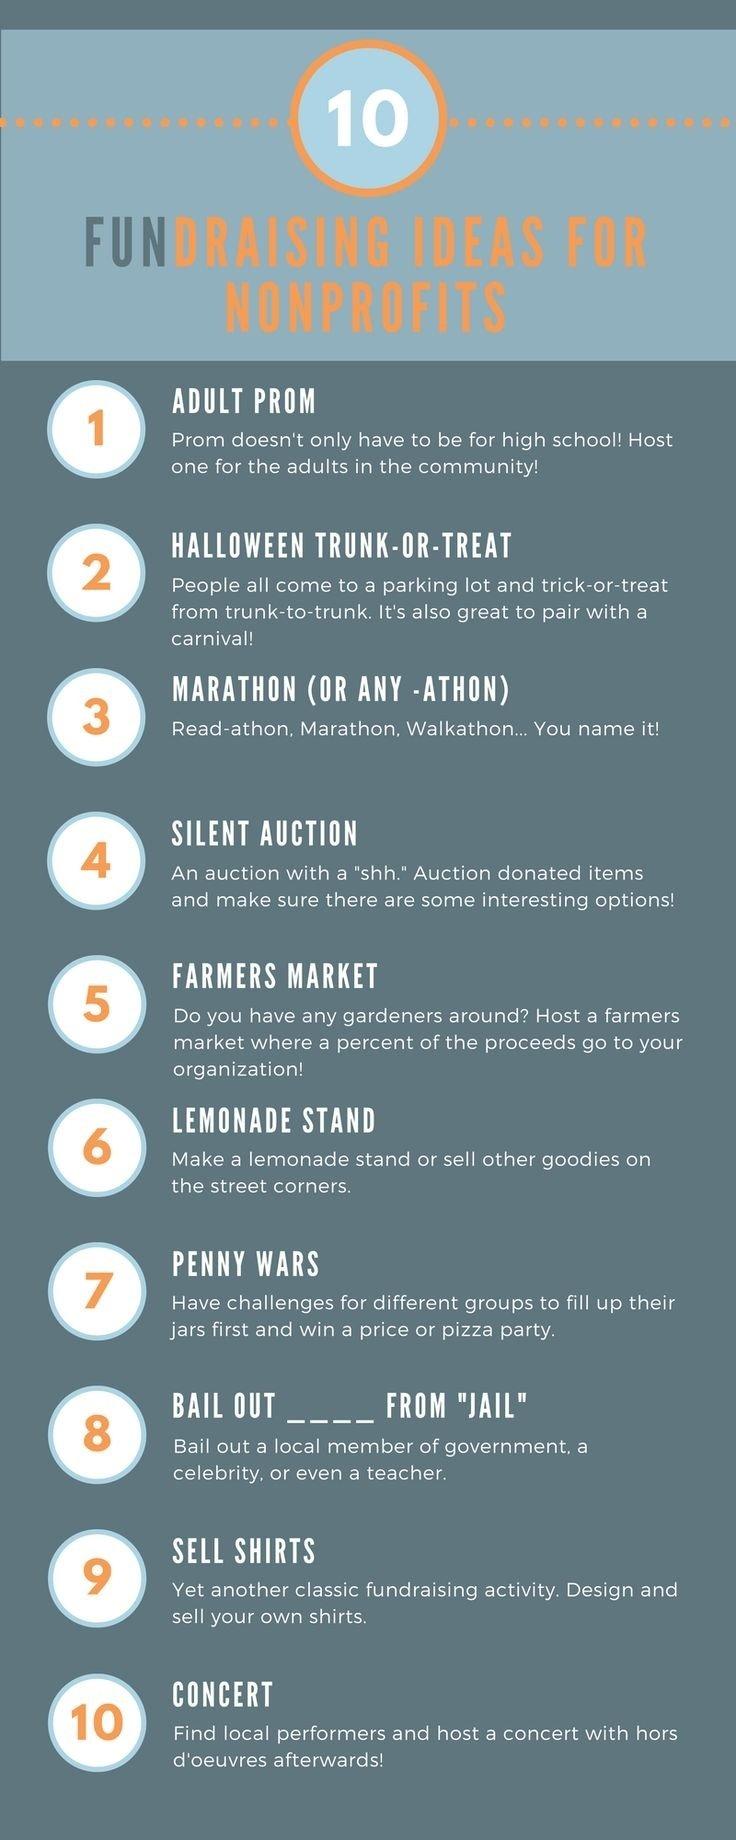 10 attractive creative fundraising ideas for nonprofits